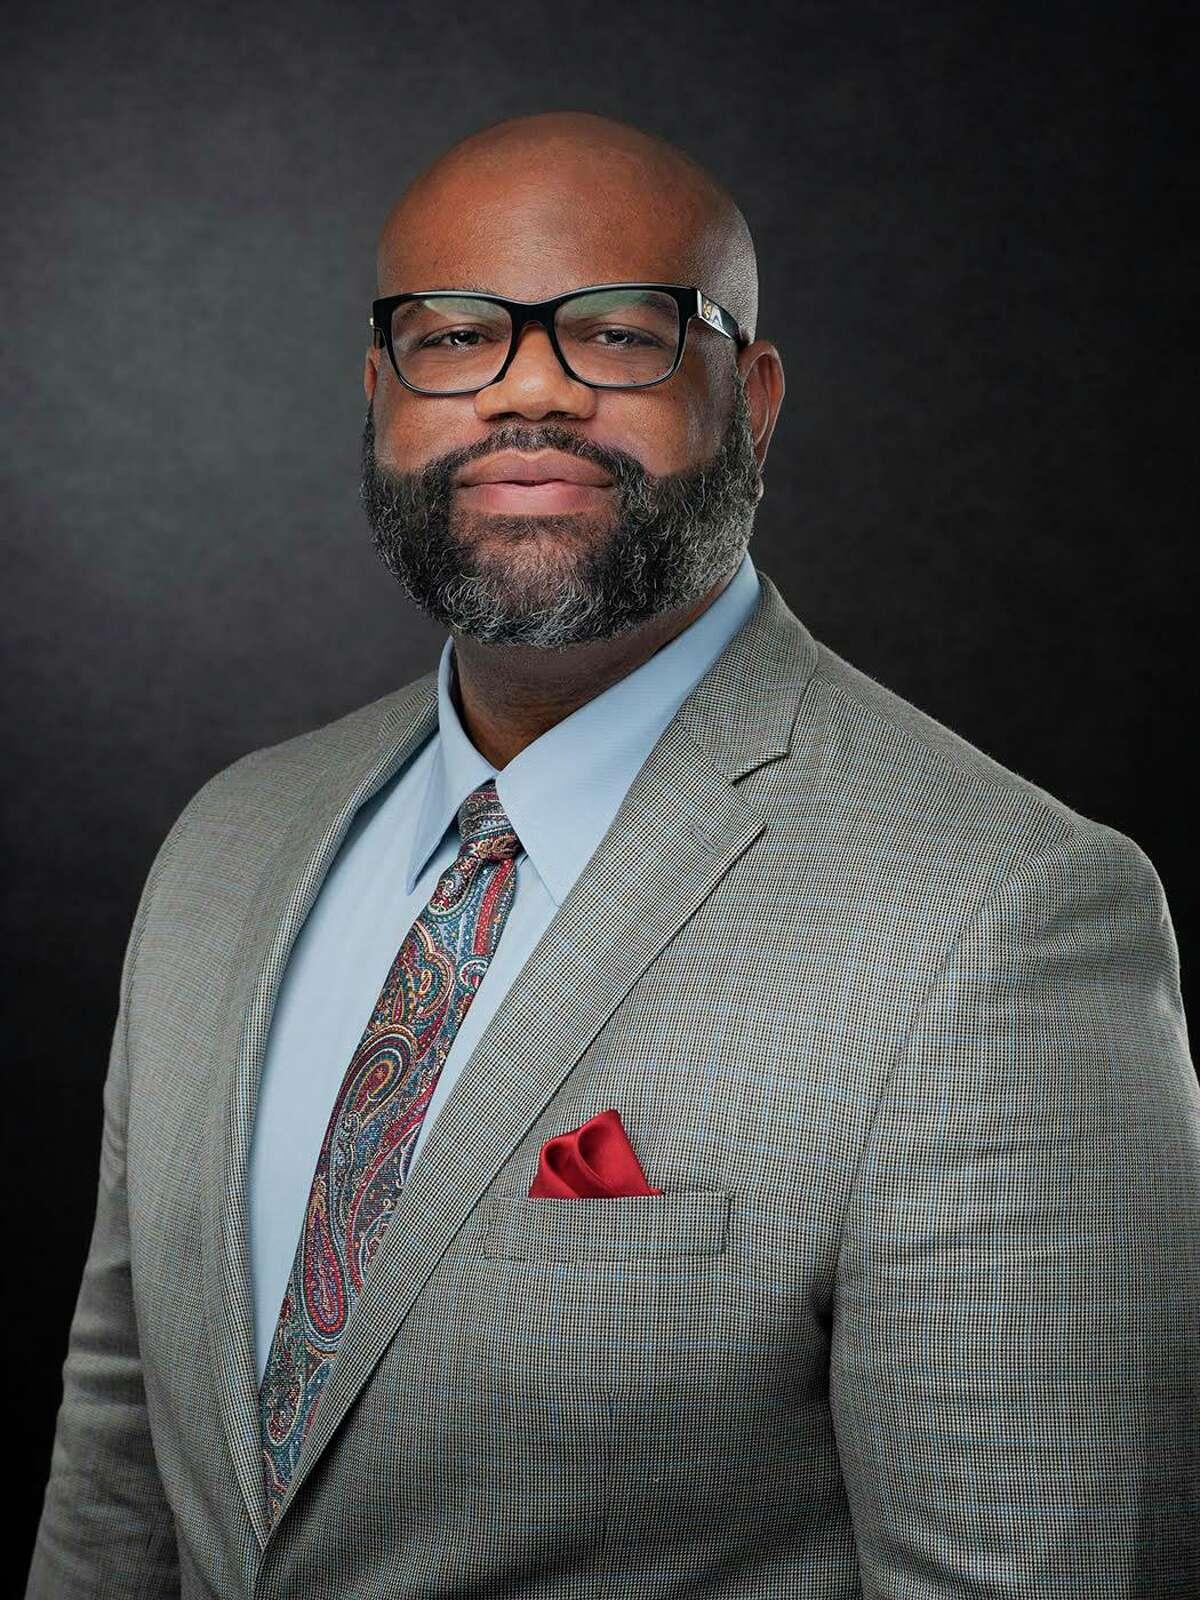 Nicholas Perkins, CEO of Black Titan Franchise Systems.